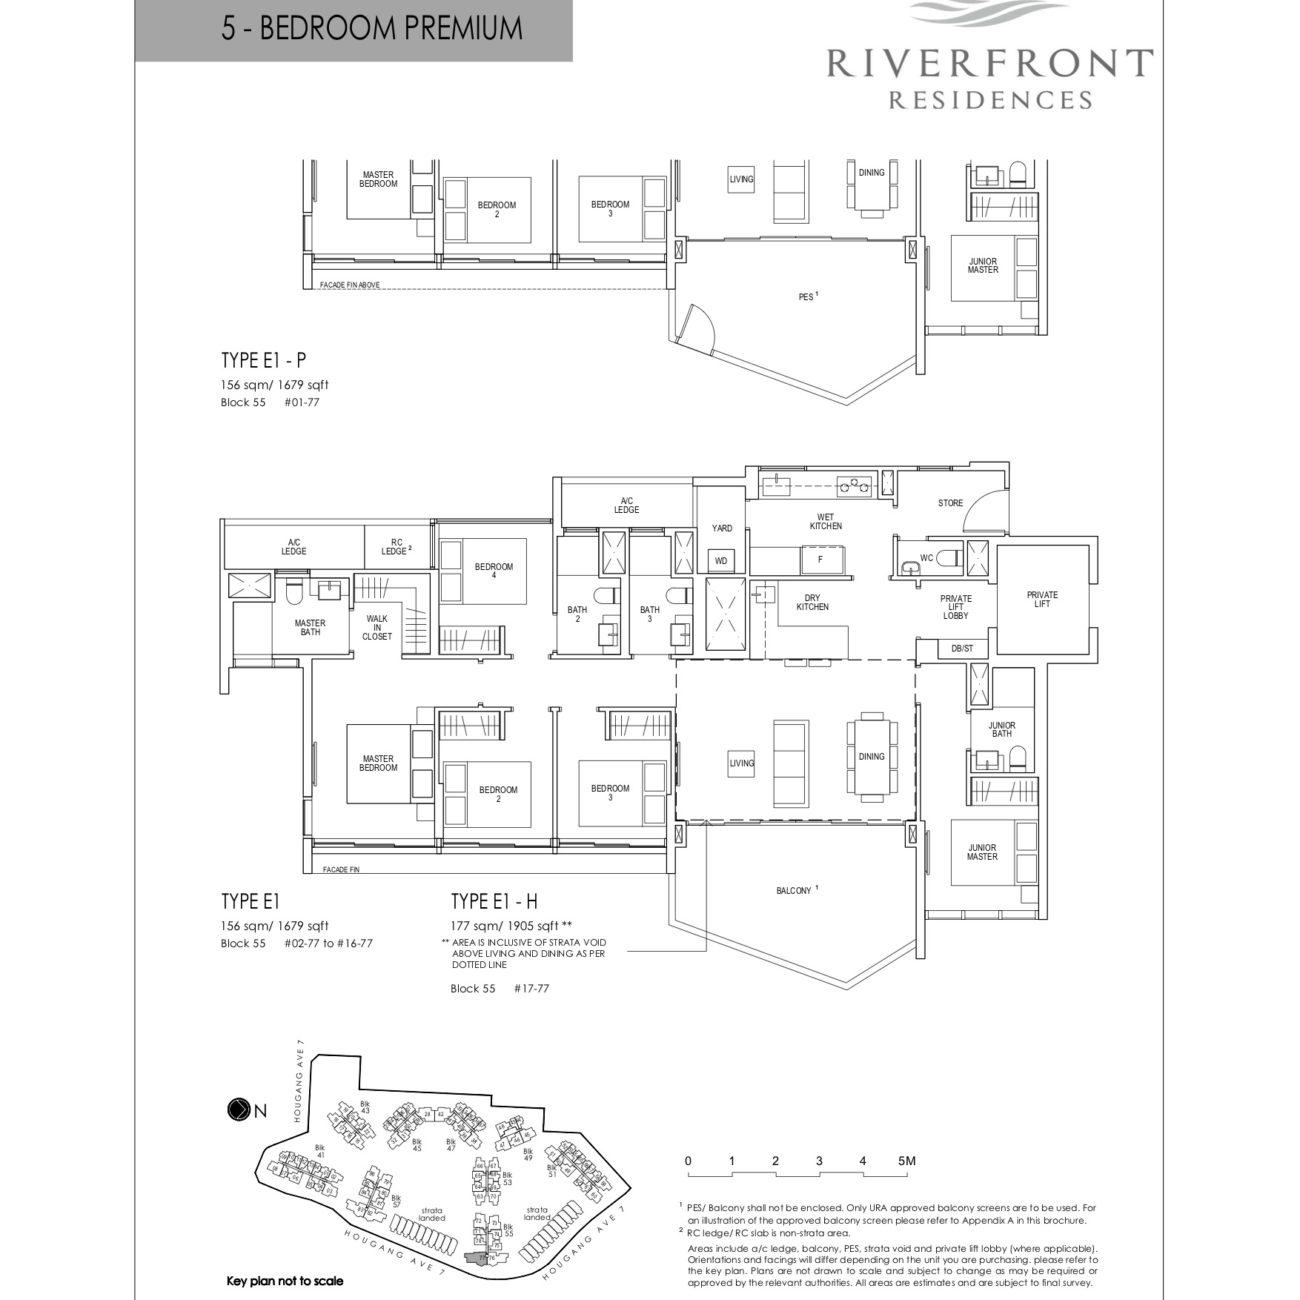 riverfront-residences-floorplan-5bedroom-e1